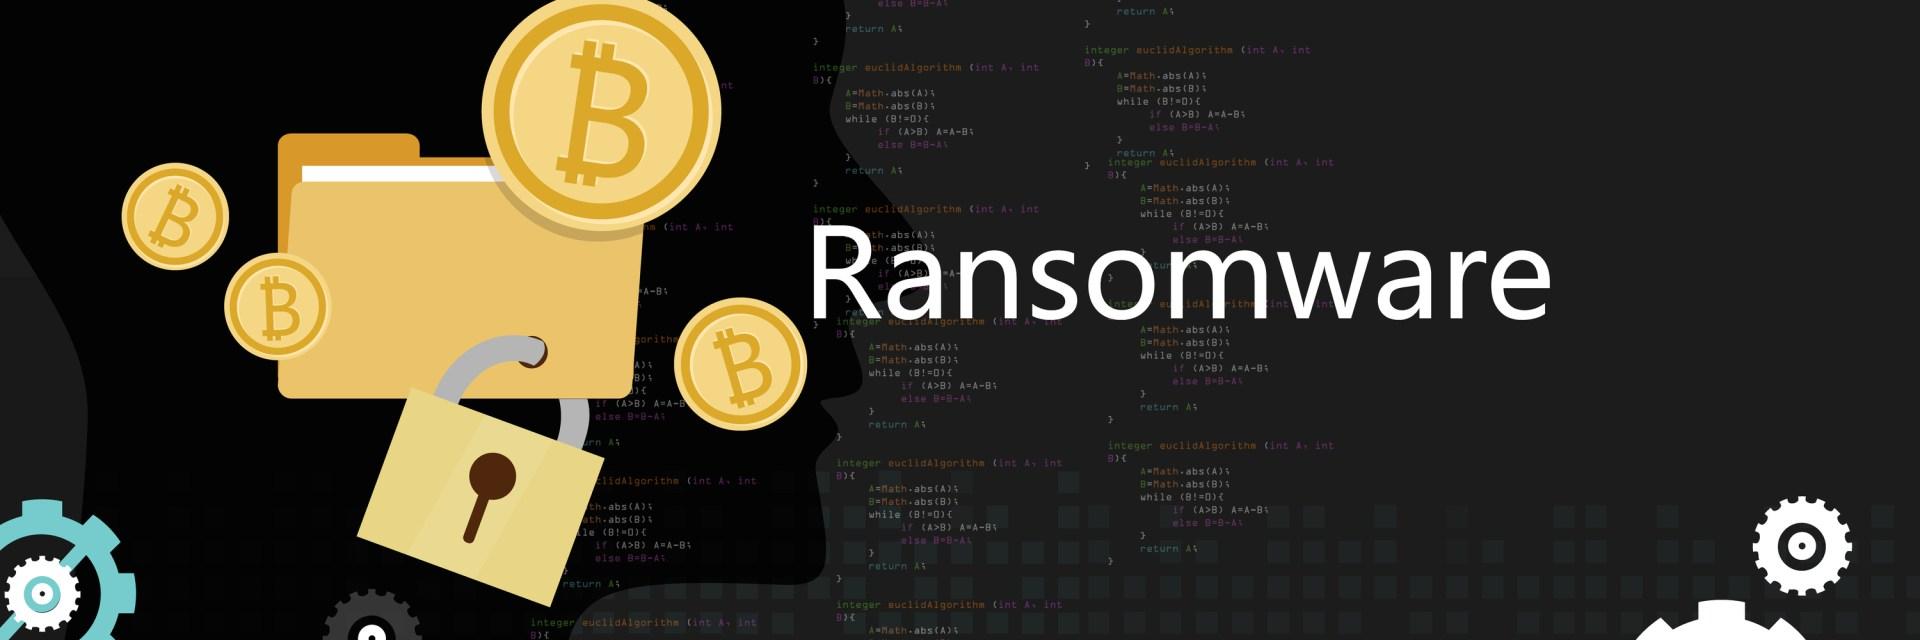 ransomware wannacry hacker malware concept of lock folder and ask money vector